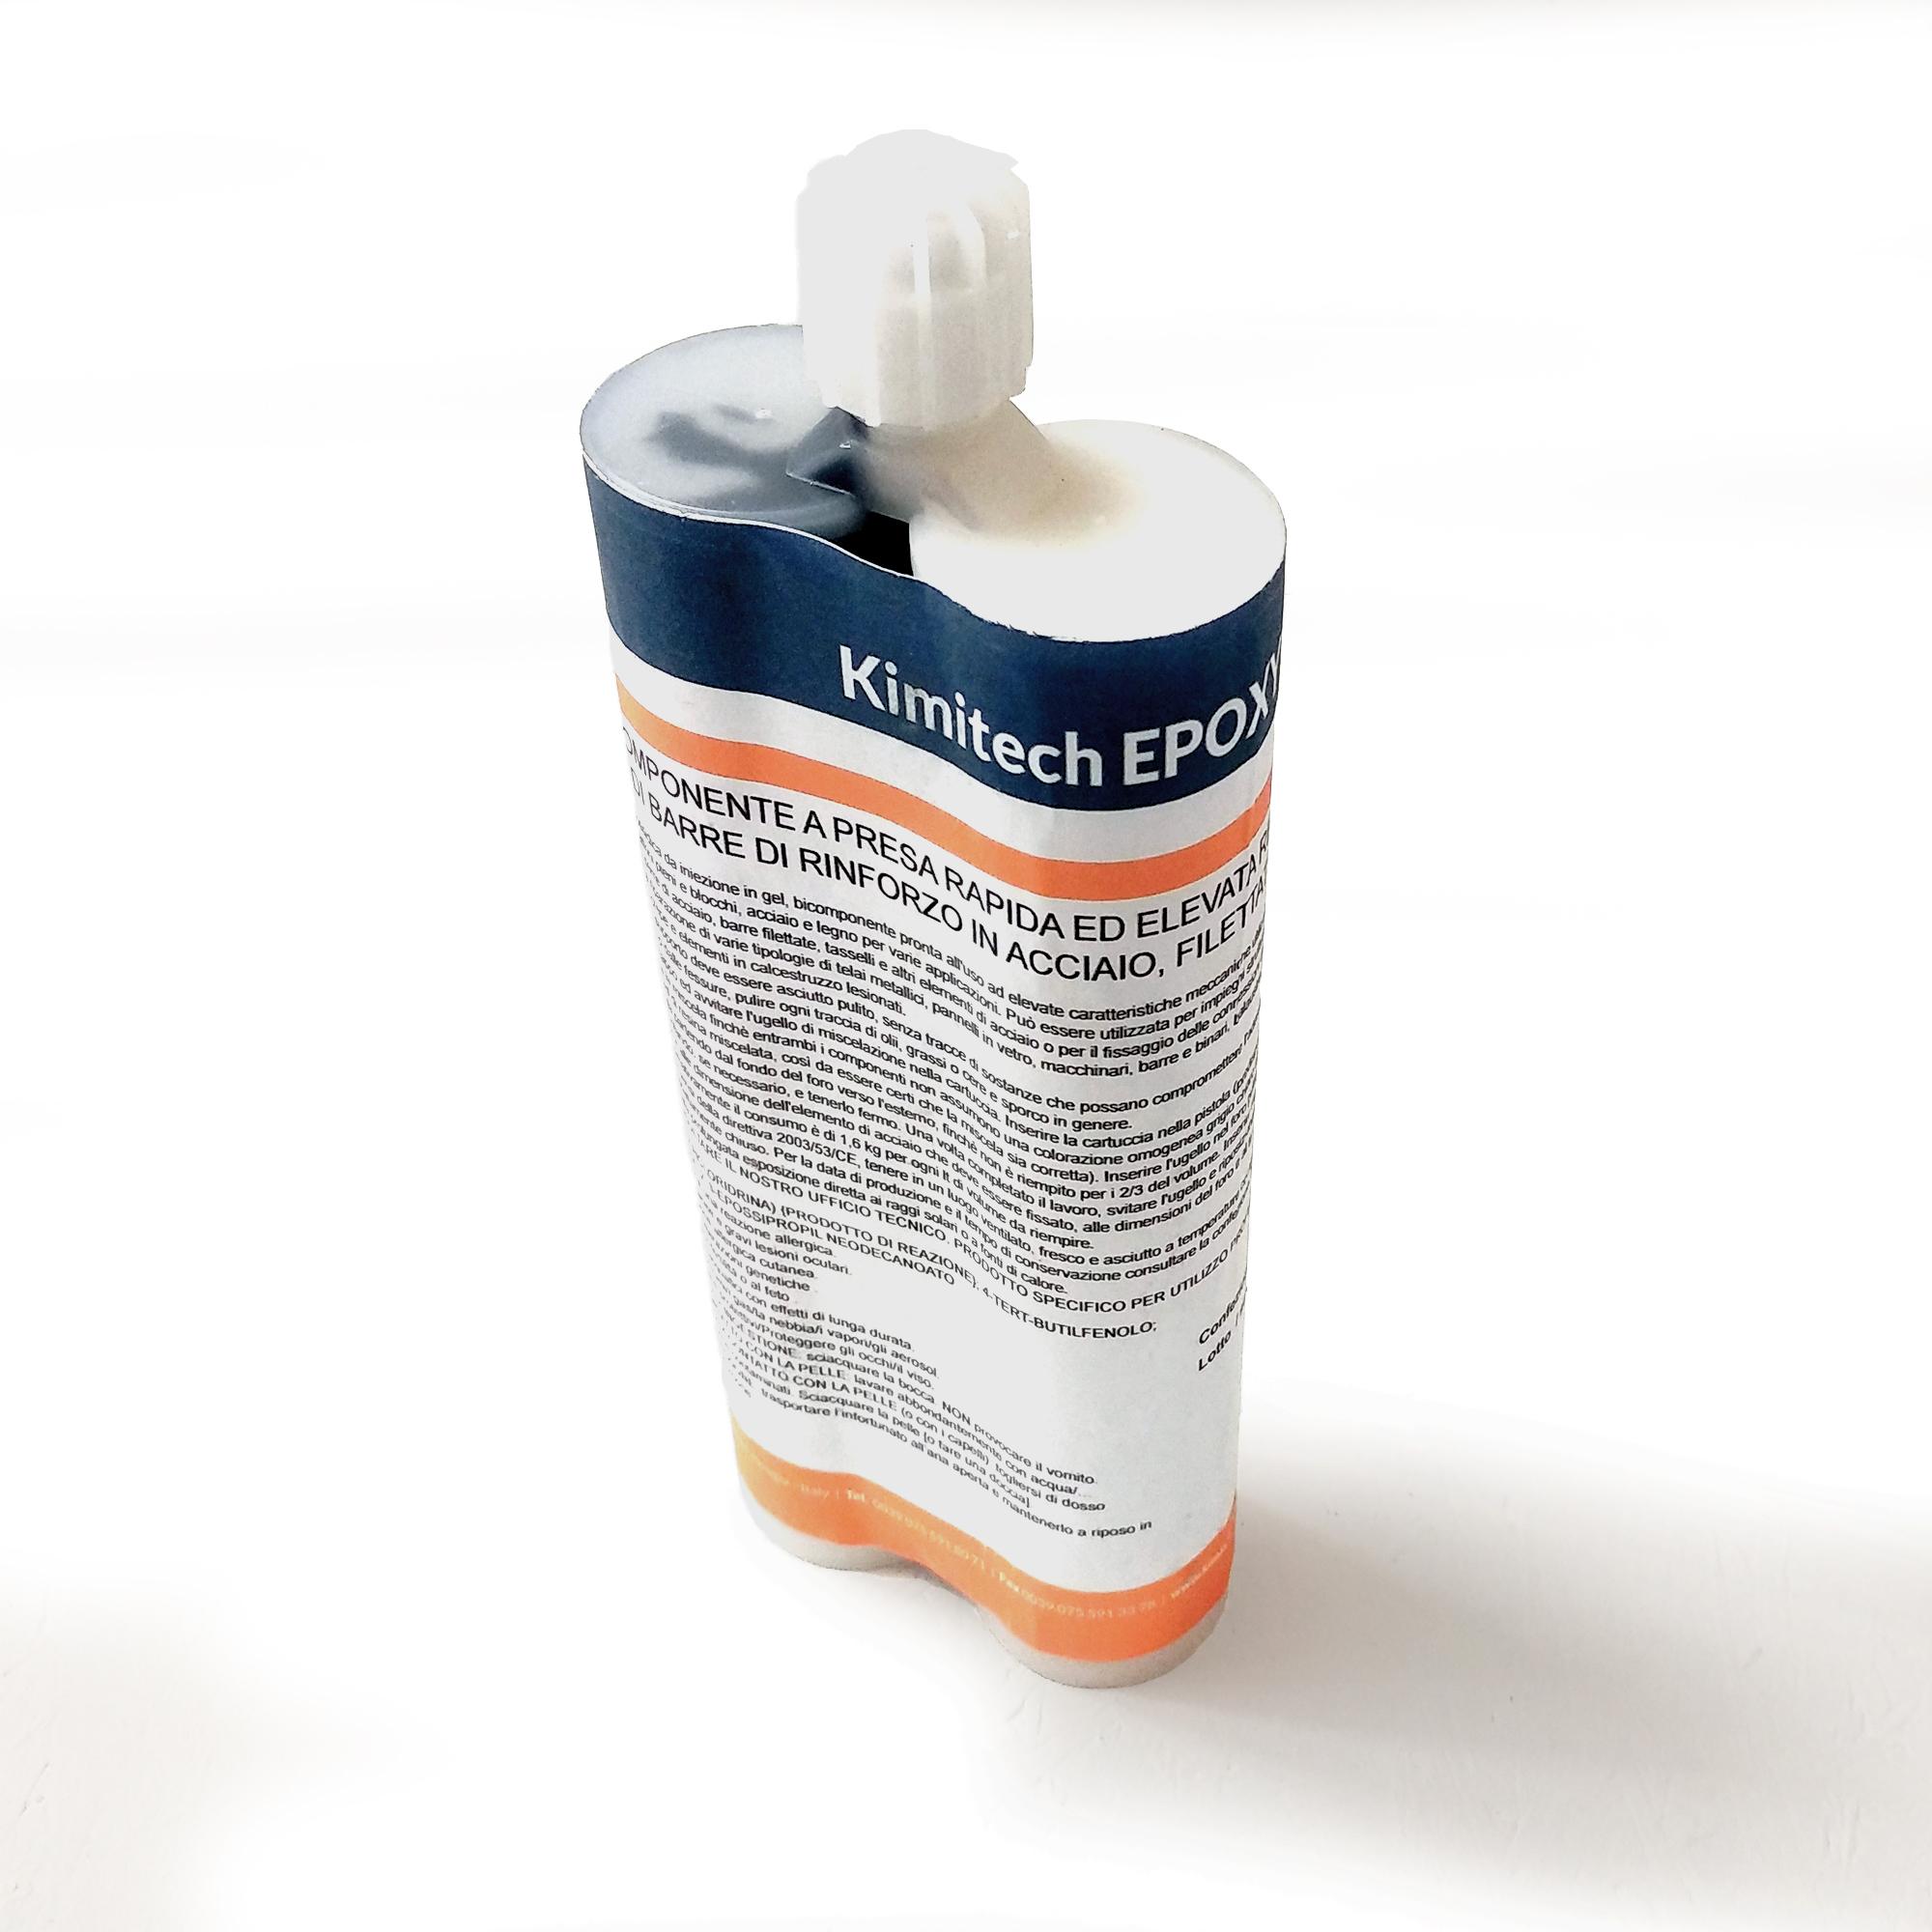 Kimitech EPOXY CTR